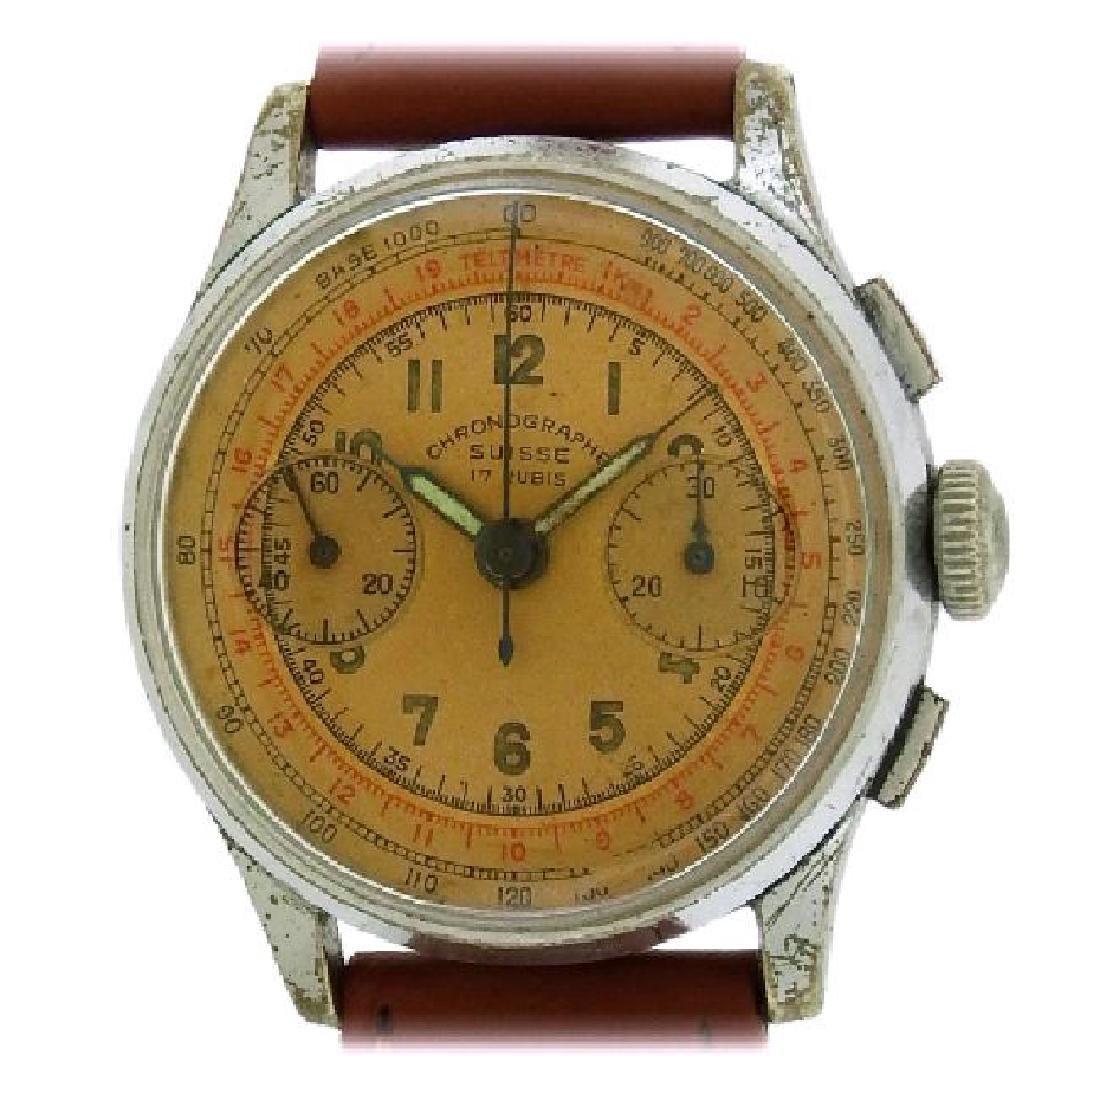 CHRONOGRAPH SUISSE | Copper Dial Chronograph | 1940s